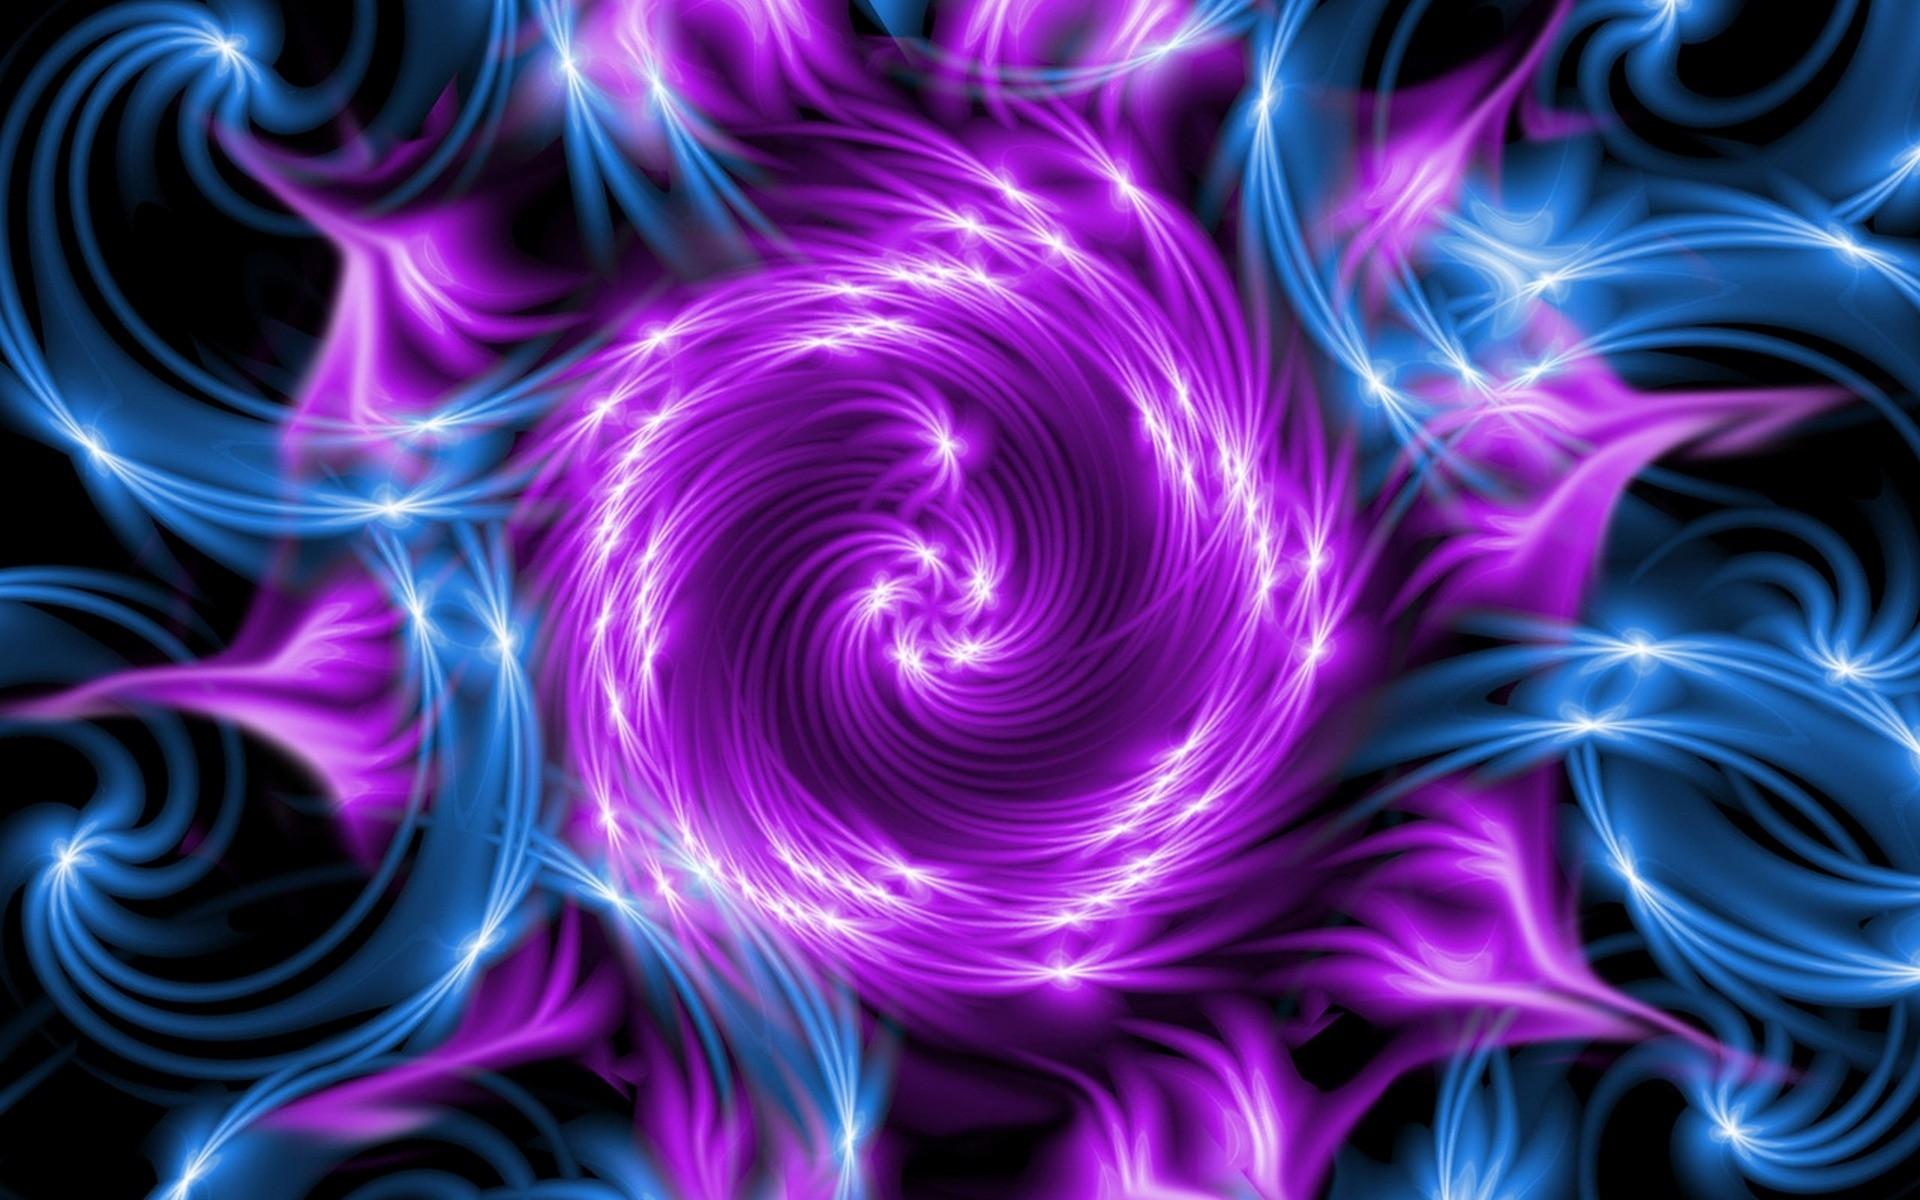 Violet Smoke Art Wallpapers: Wallpaper : Illustration, Purple, Smoke, Symmetry, Circle